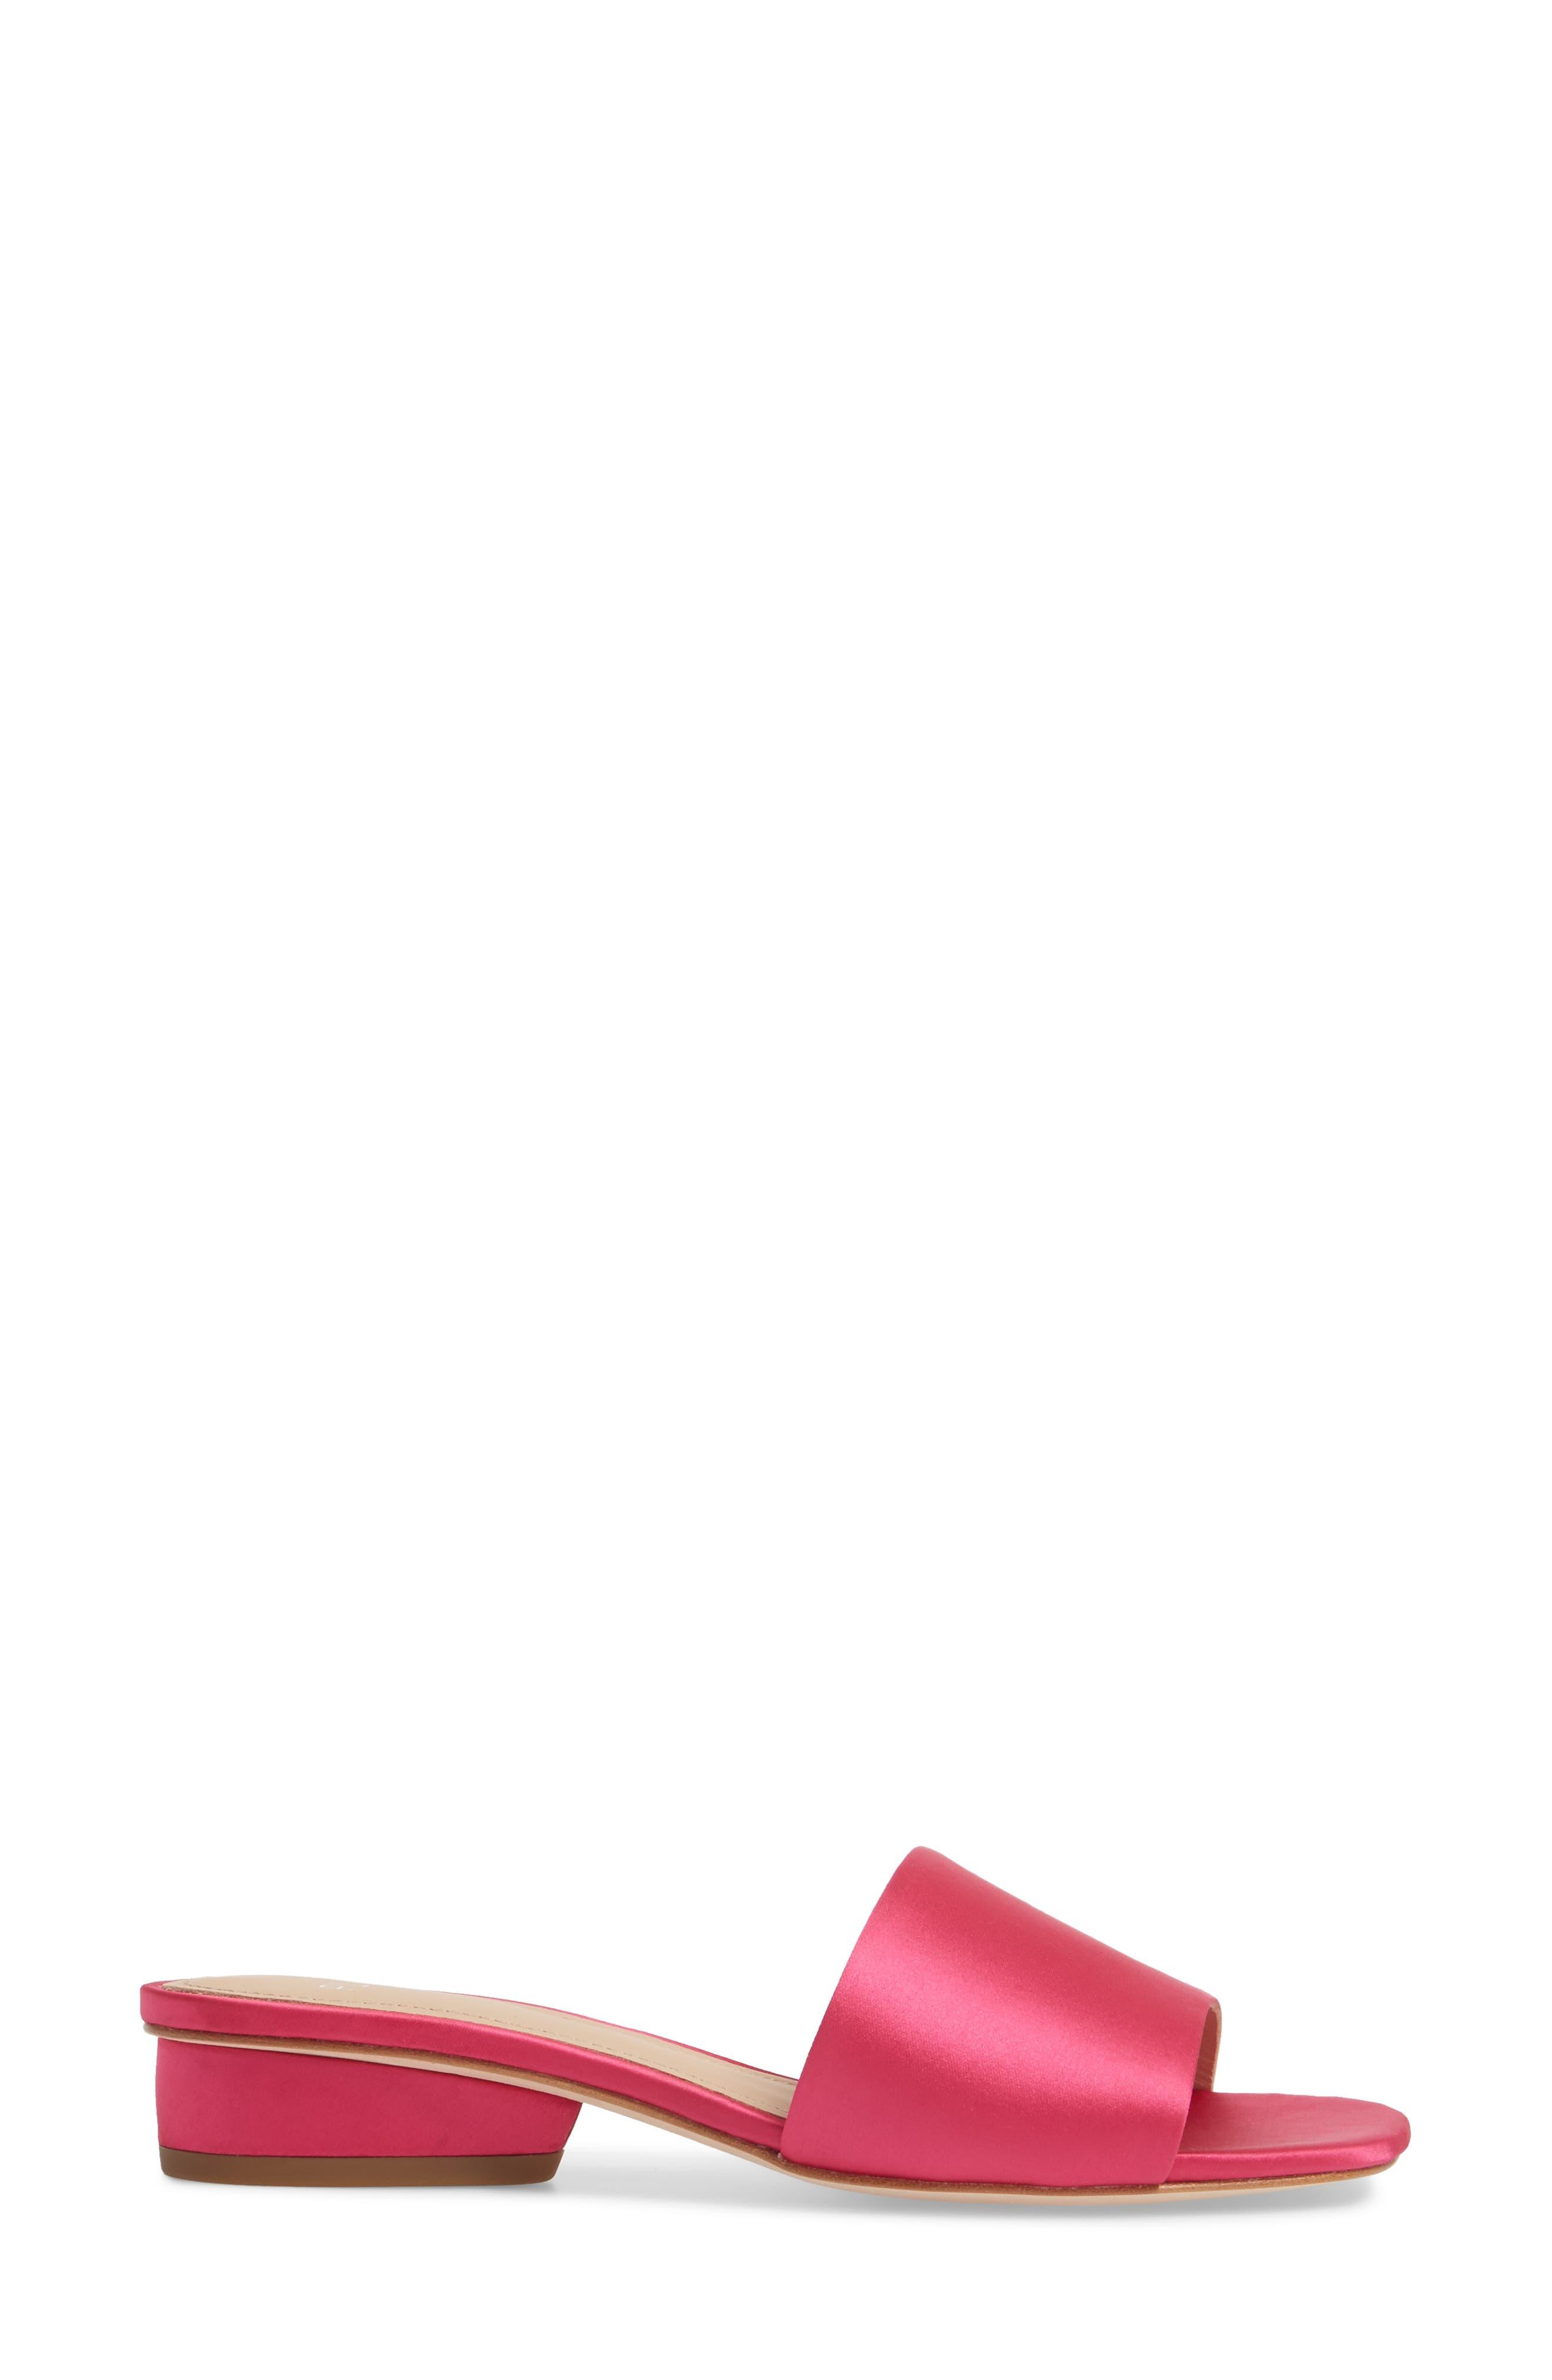 Mallory Slide Sandal,                             Alternate thumbnail 3, color,                             Azalea Satin